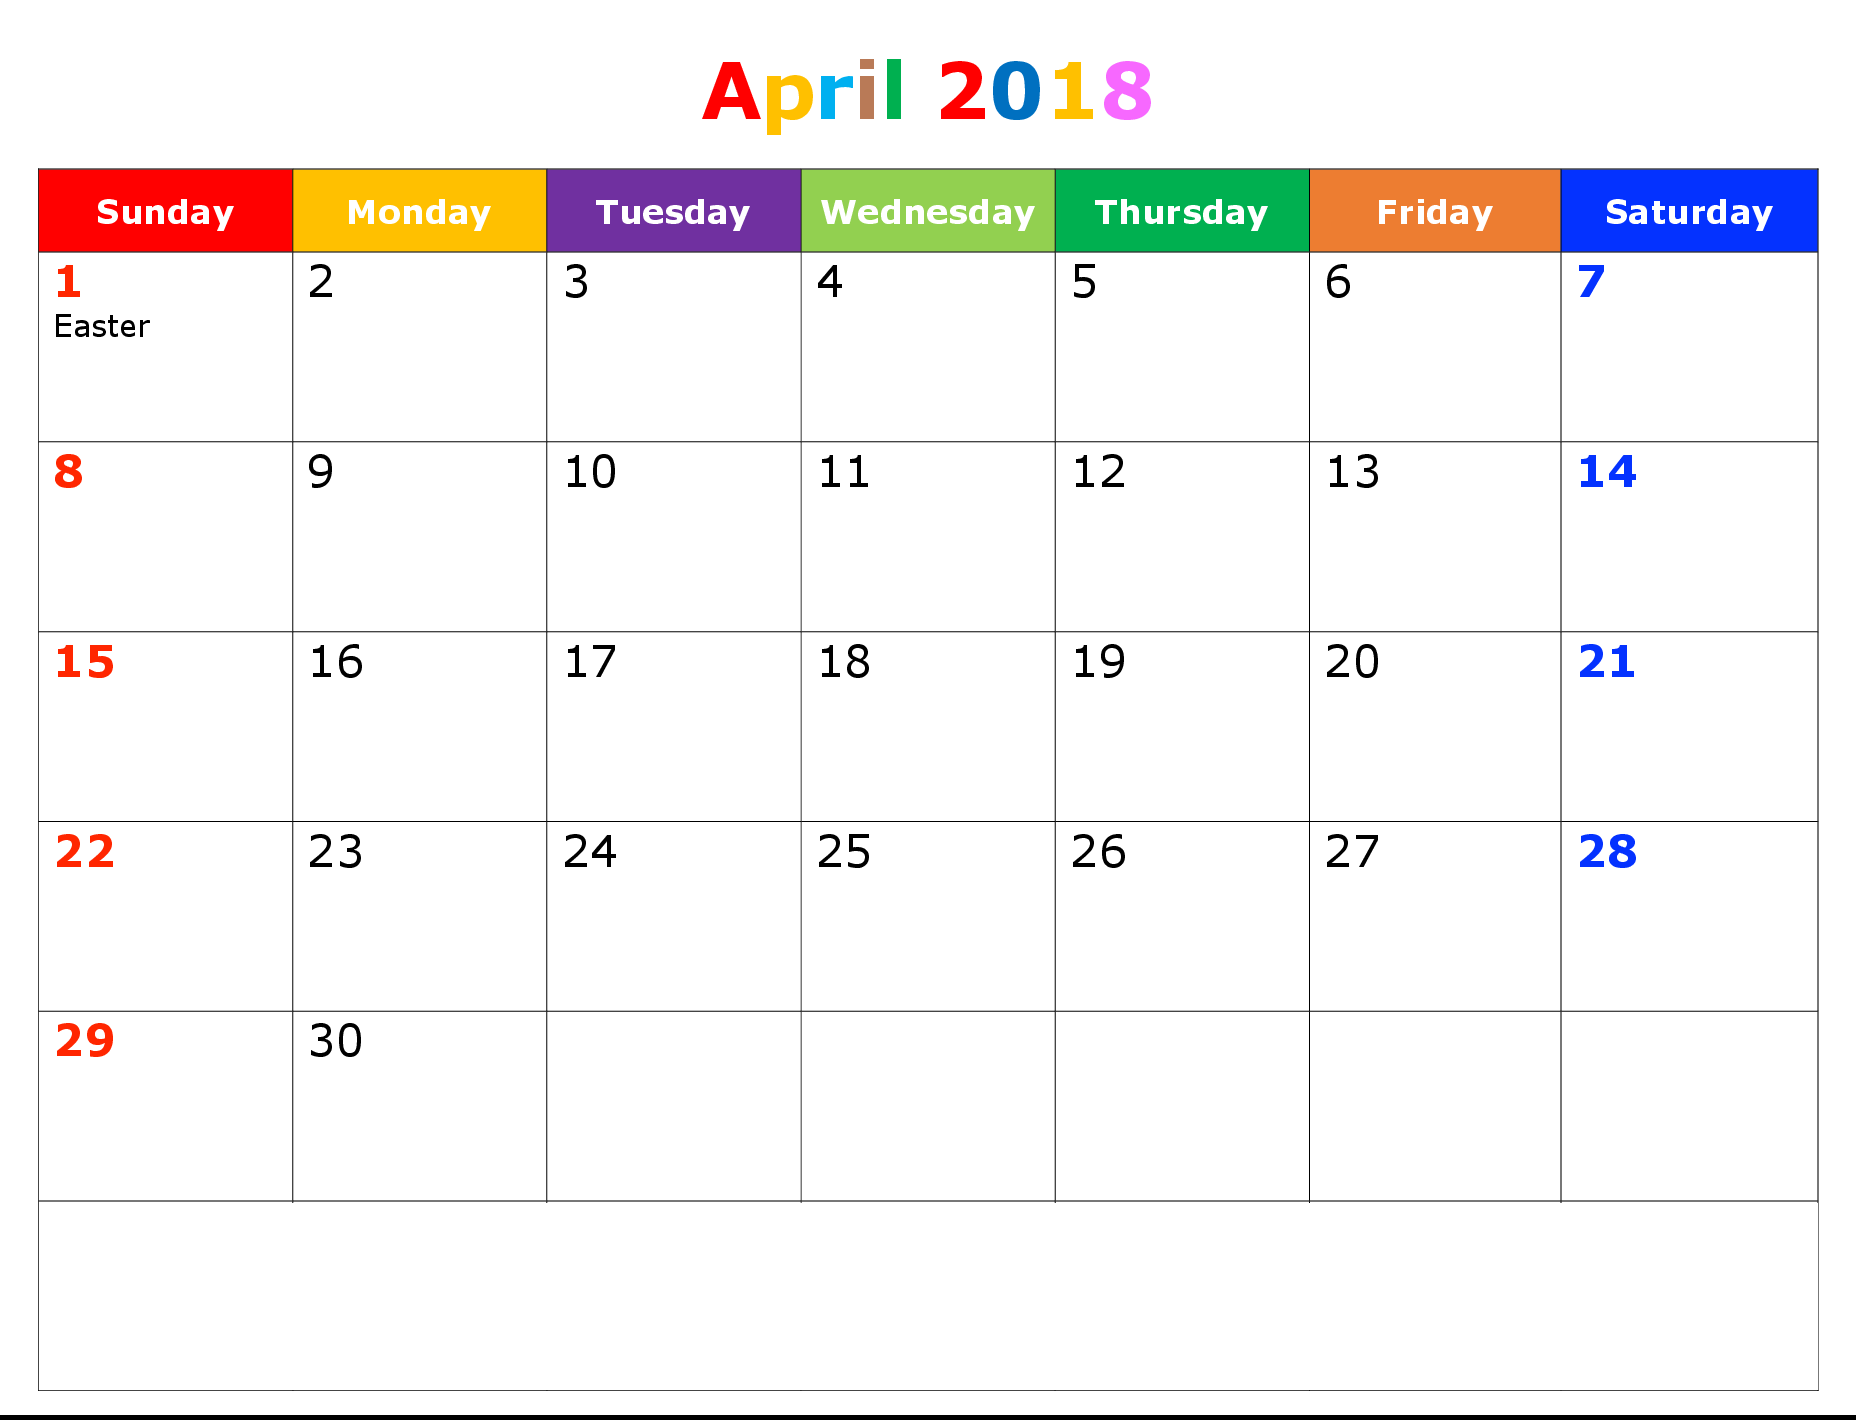 April 2018 printable calendar template printable calendar templates april 2018 calendar printable maxwellsz